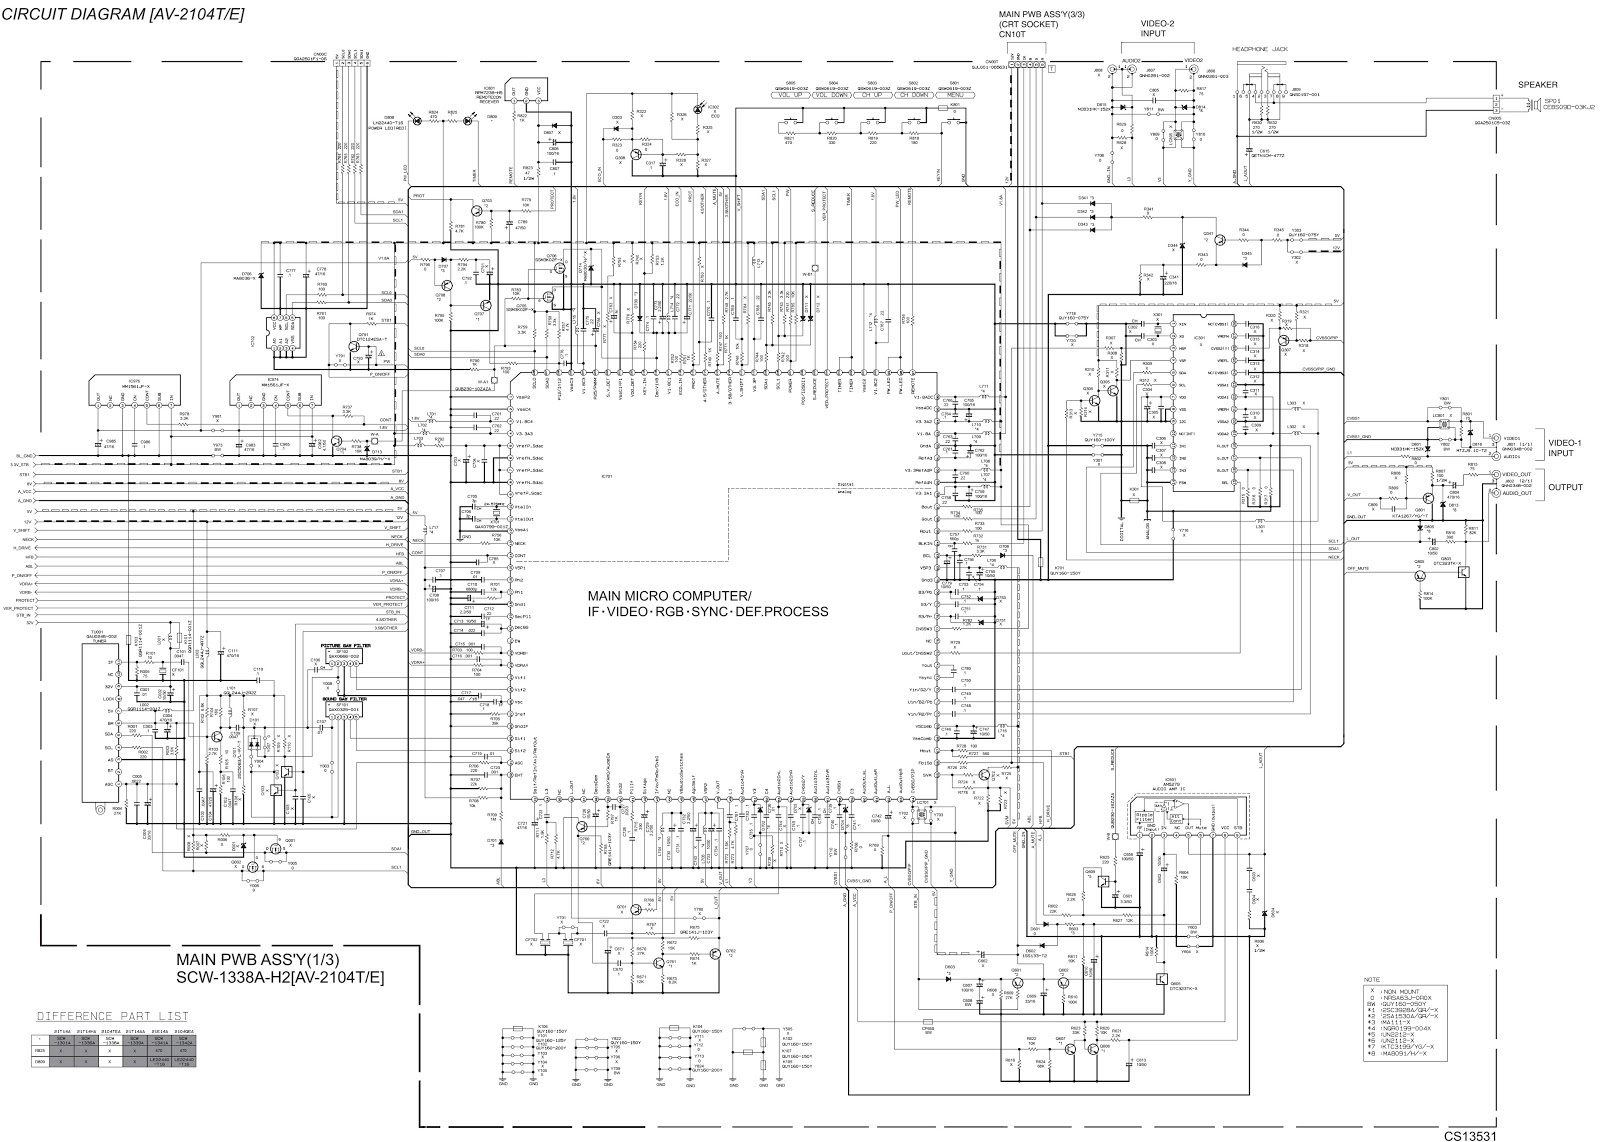 medium resolution of jvc av21tmg4 u2013 jvc av2104t u2013 crt tv u2013 circuit diagram u2013